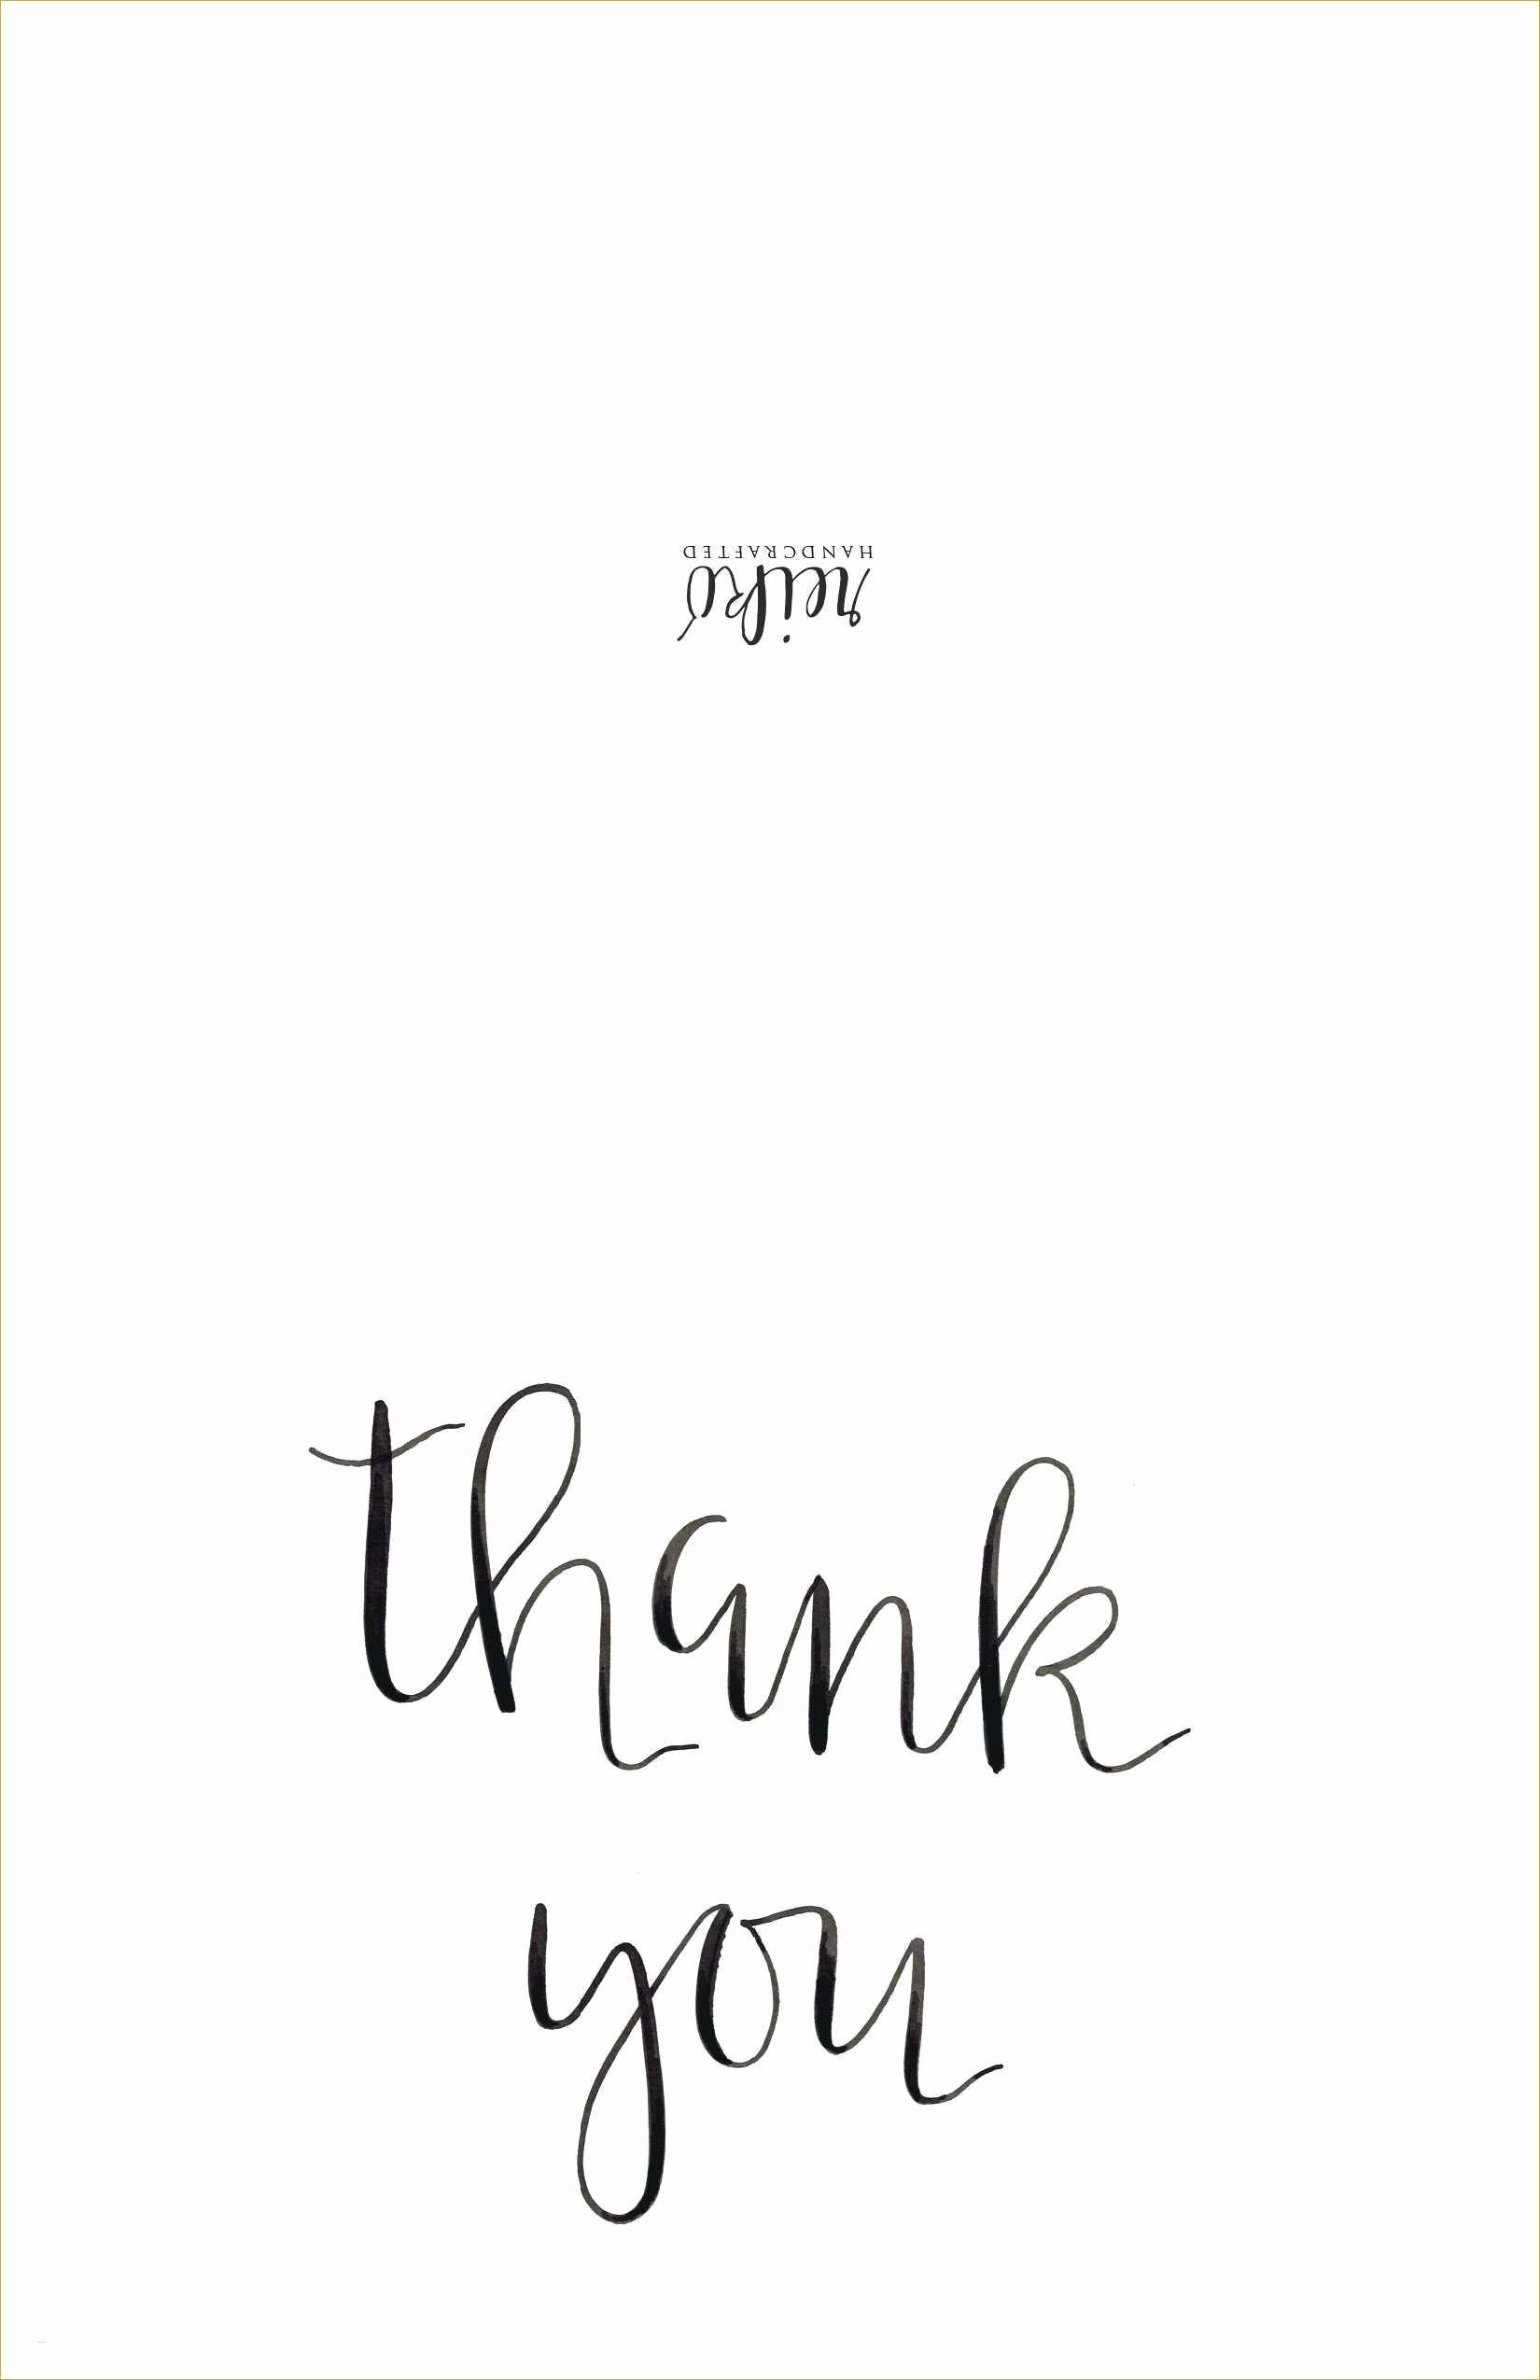 Graduation Thank Yous Inspirational Best Custom Thank You Notes With Graduation Thank Y Printable Thank You Cards Thank You Card Template Thank You Card Design